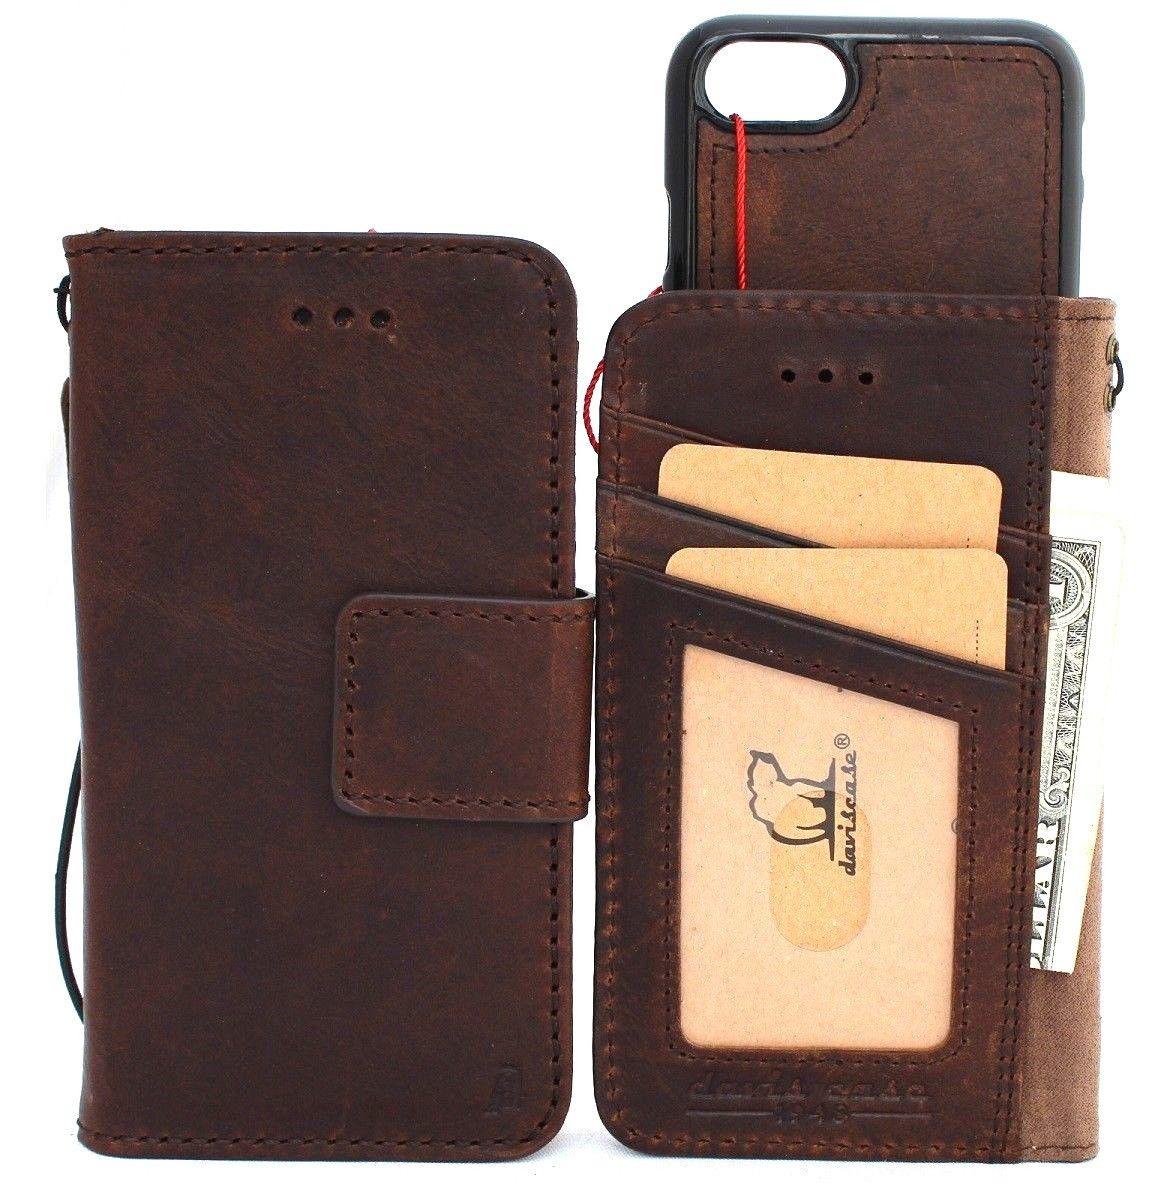 genuine leather iphone 8 case